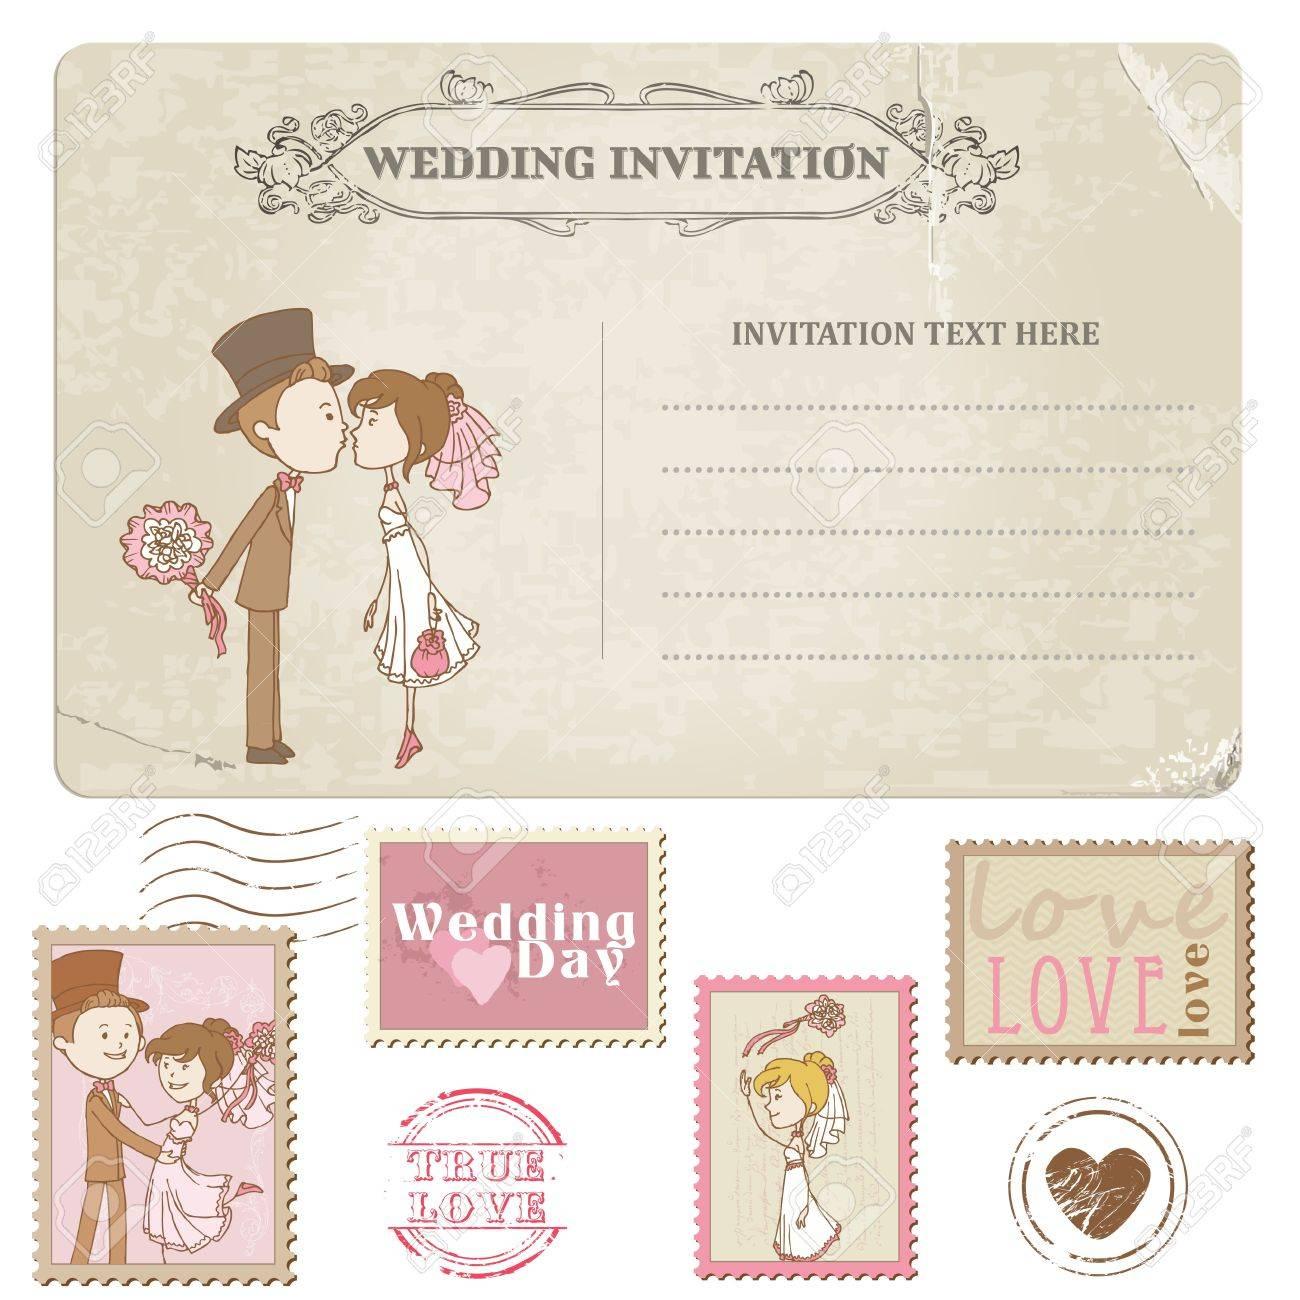 Wedding Postcard And Postage Stamps   For Wedding Design, Invitation,  Congratulation, Scrapbook Stock